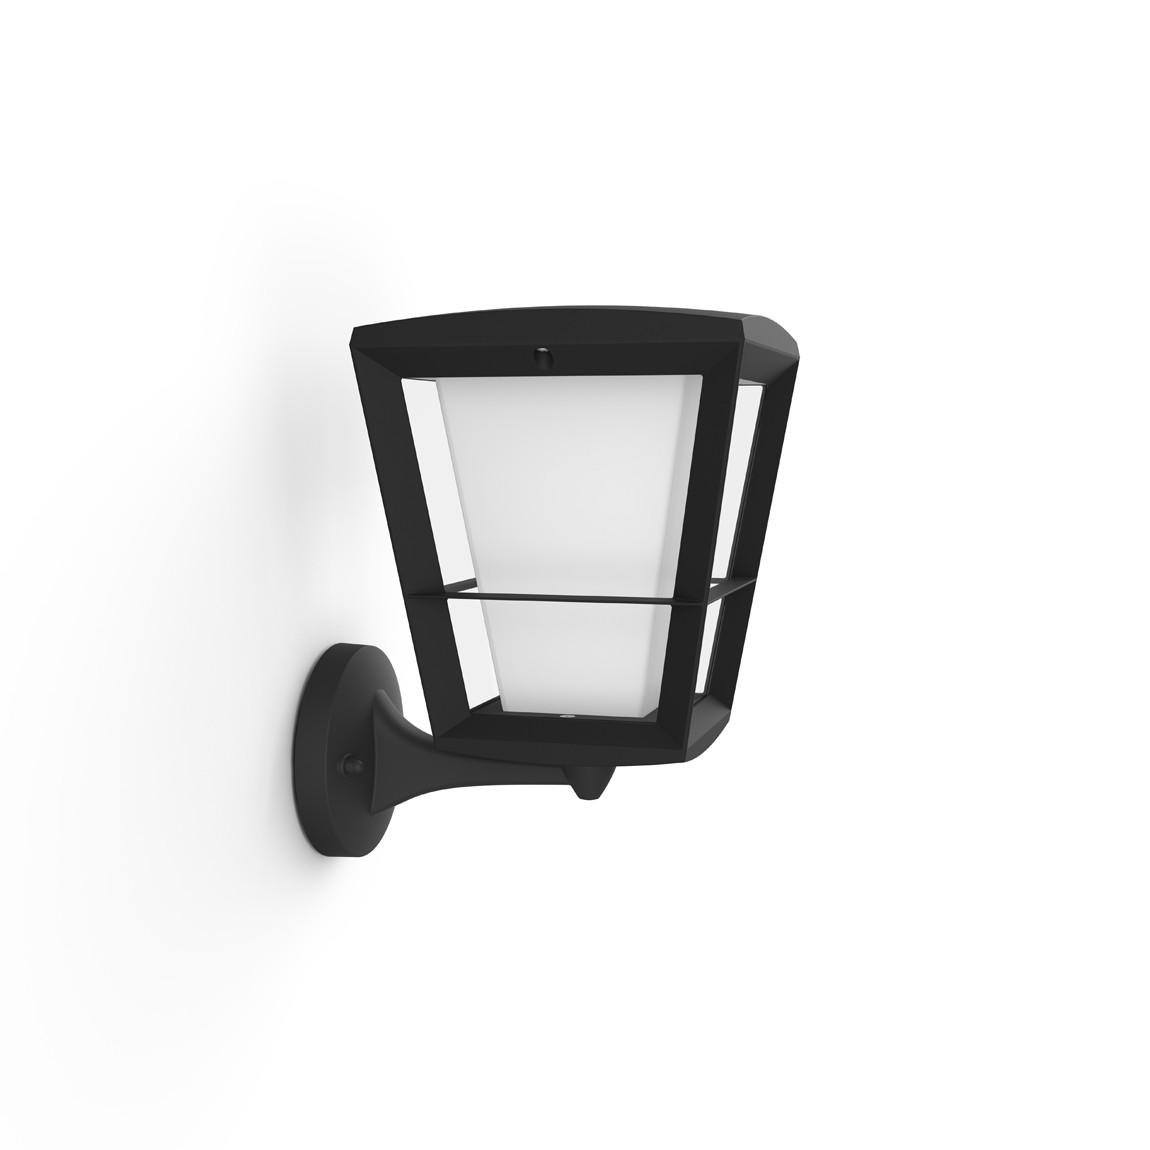 Philips Hue LED Wandleuchte Laternenform Stehend Econic - Schwarz